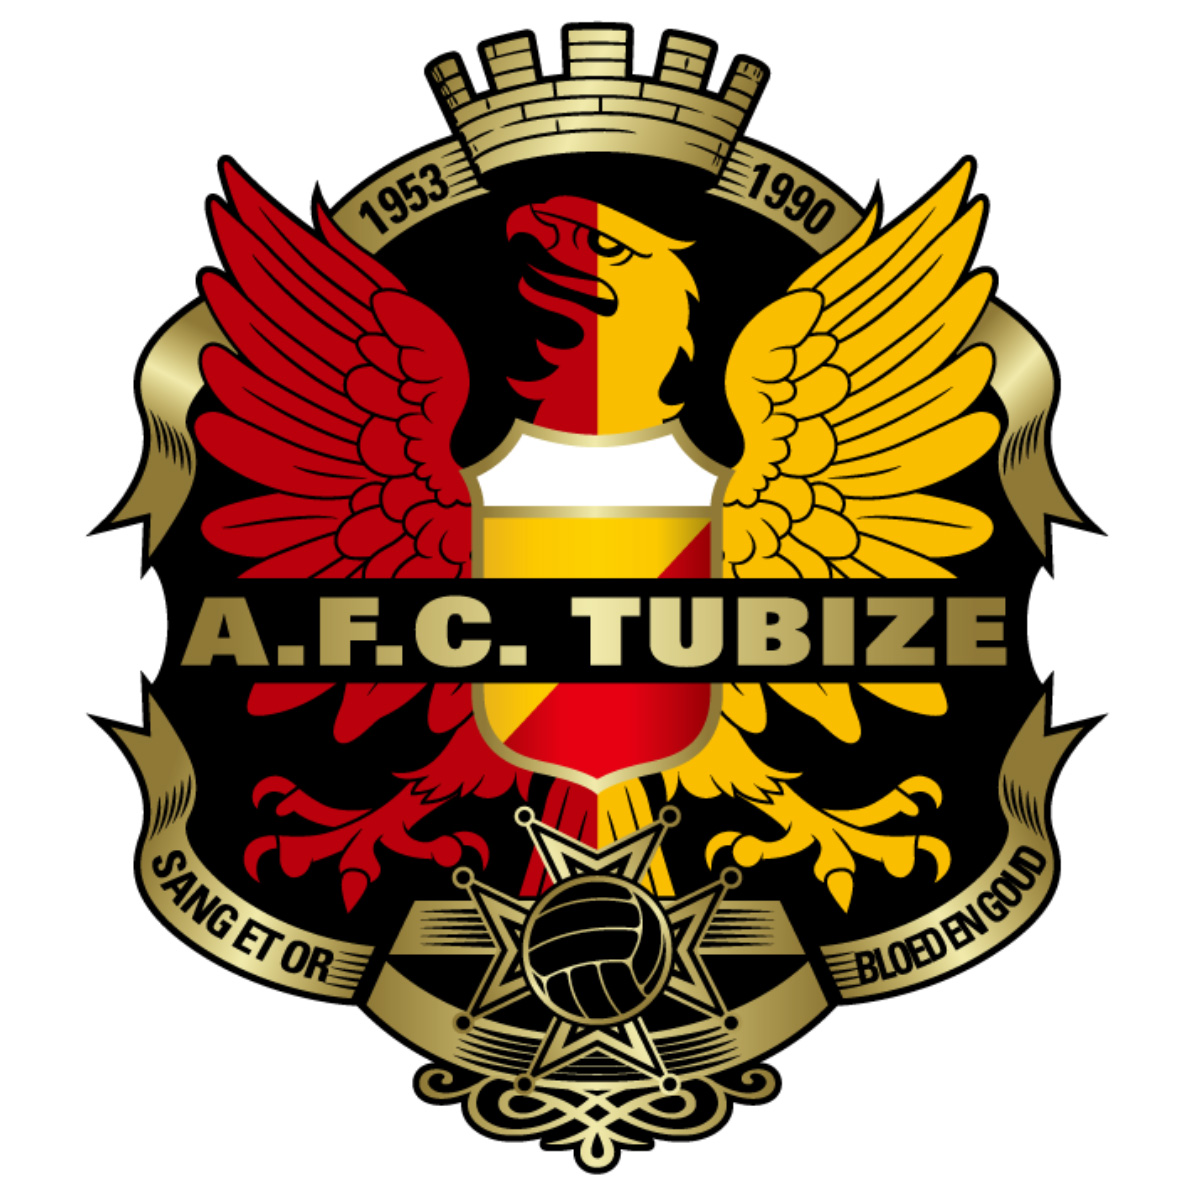 Tubize team logo